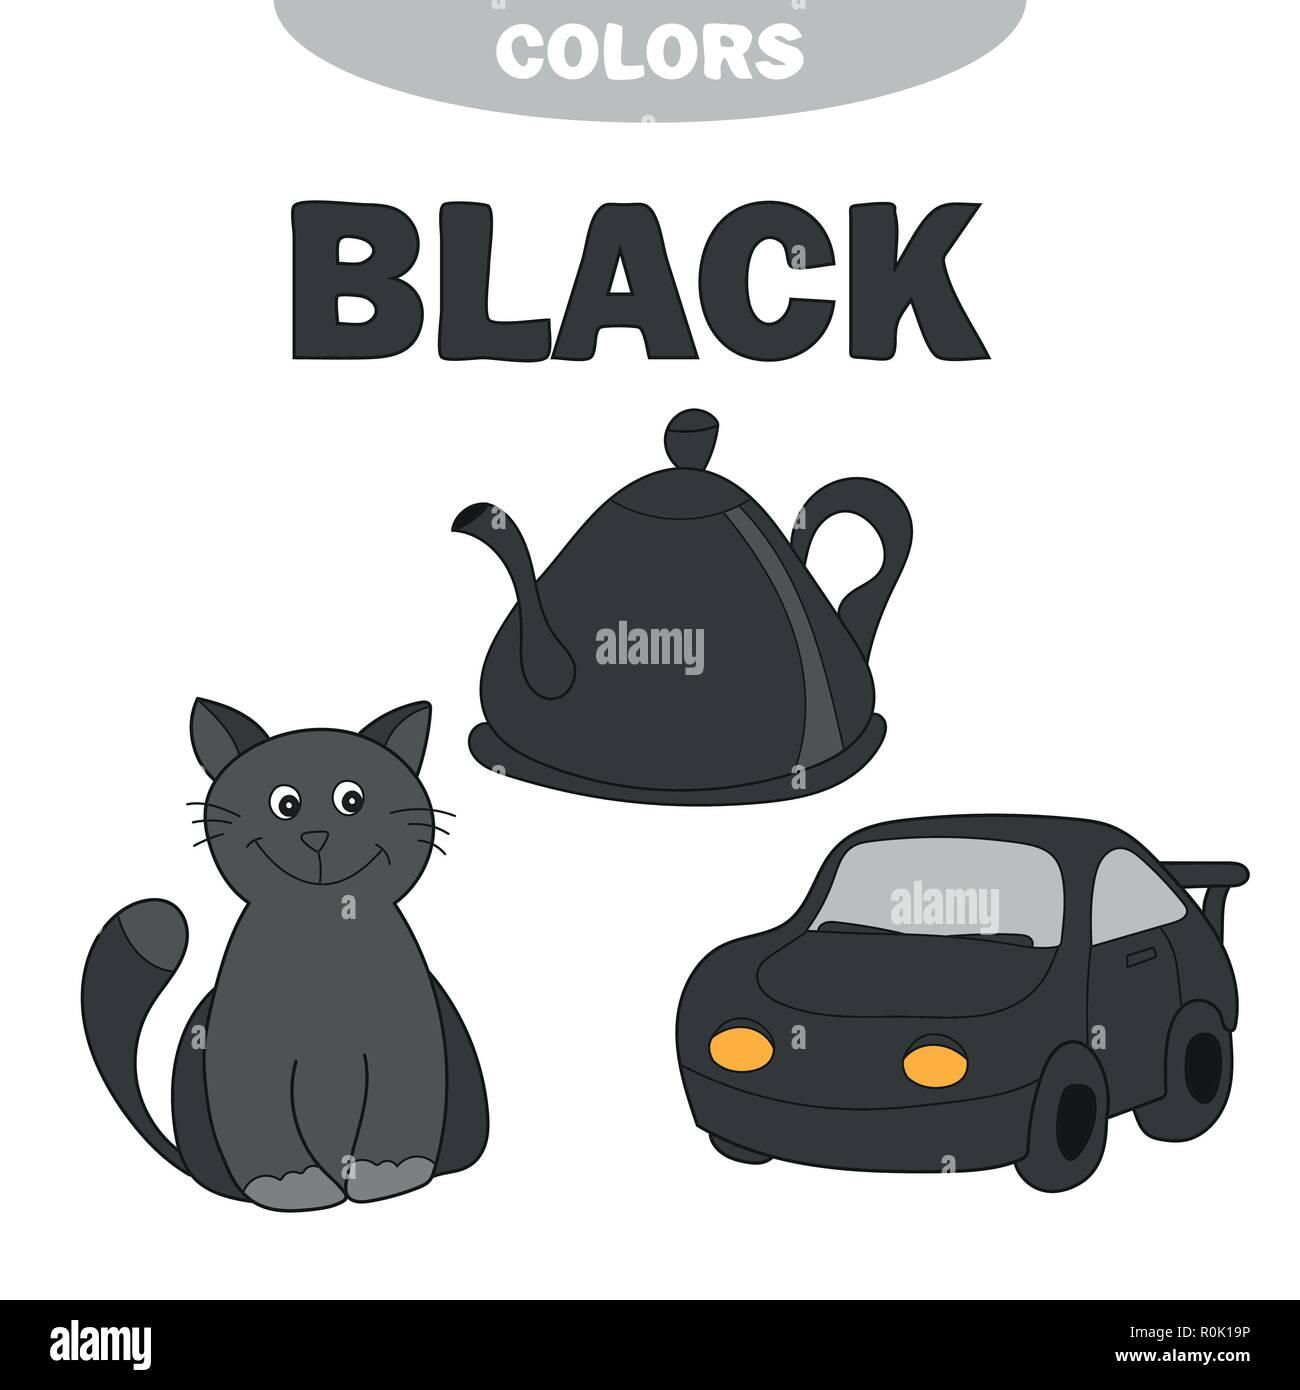 Learn Colors Worksheet Set For Kids Black Stock Vector